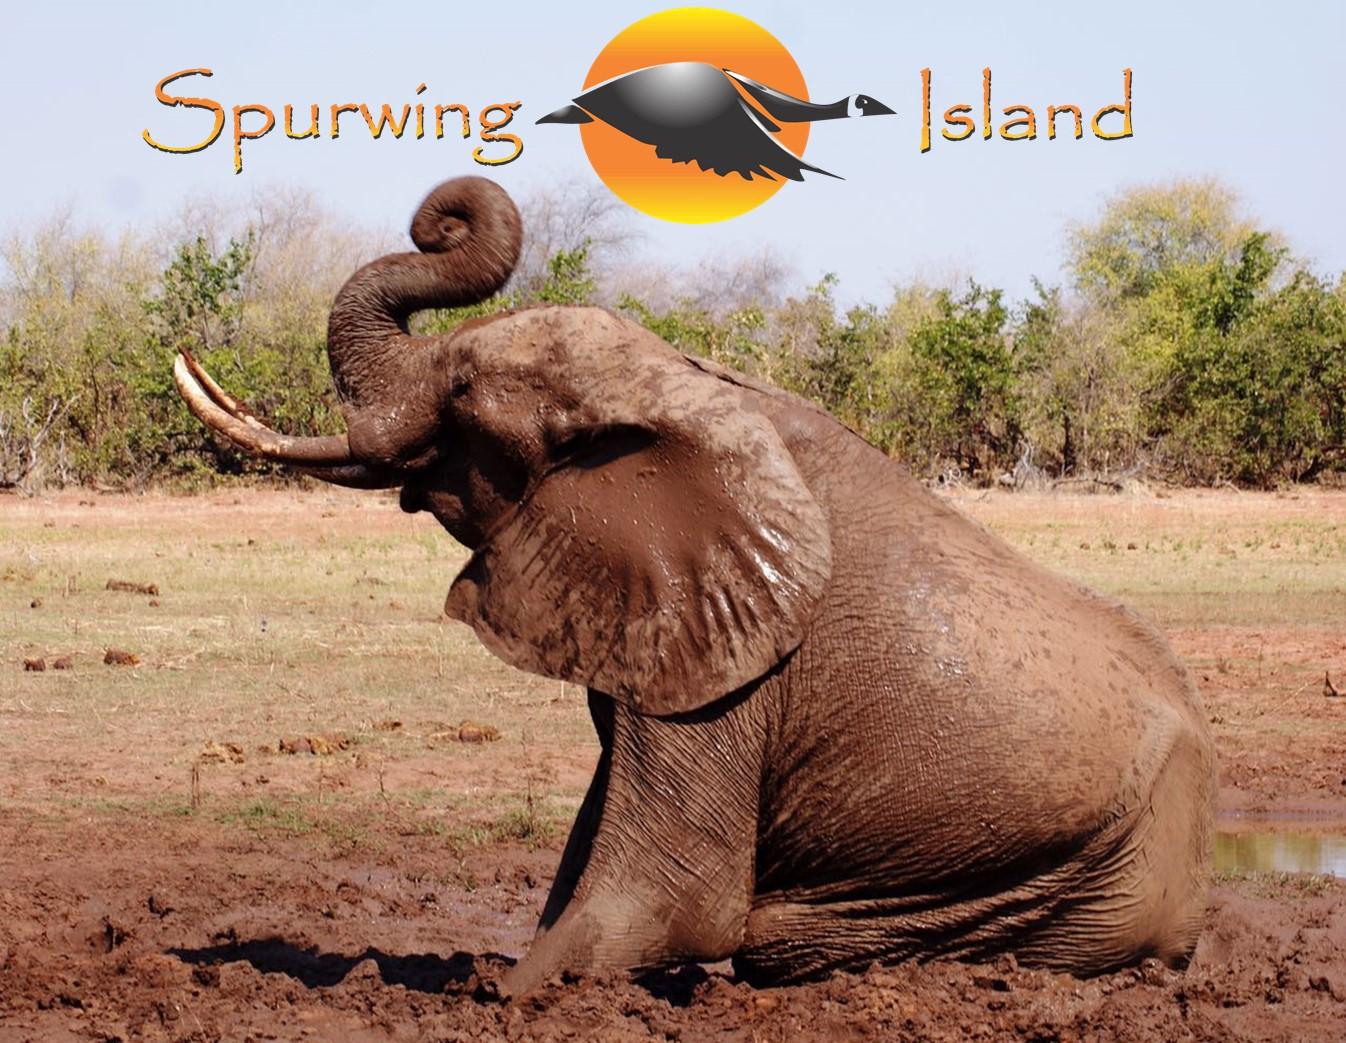 Elephant at Spurwing Island, Lake Kariba